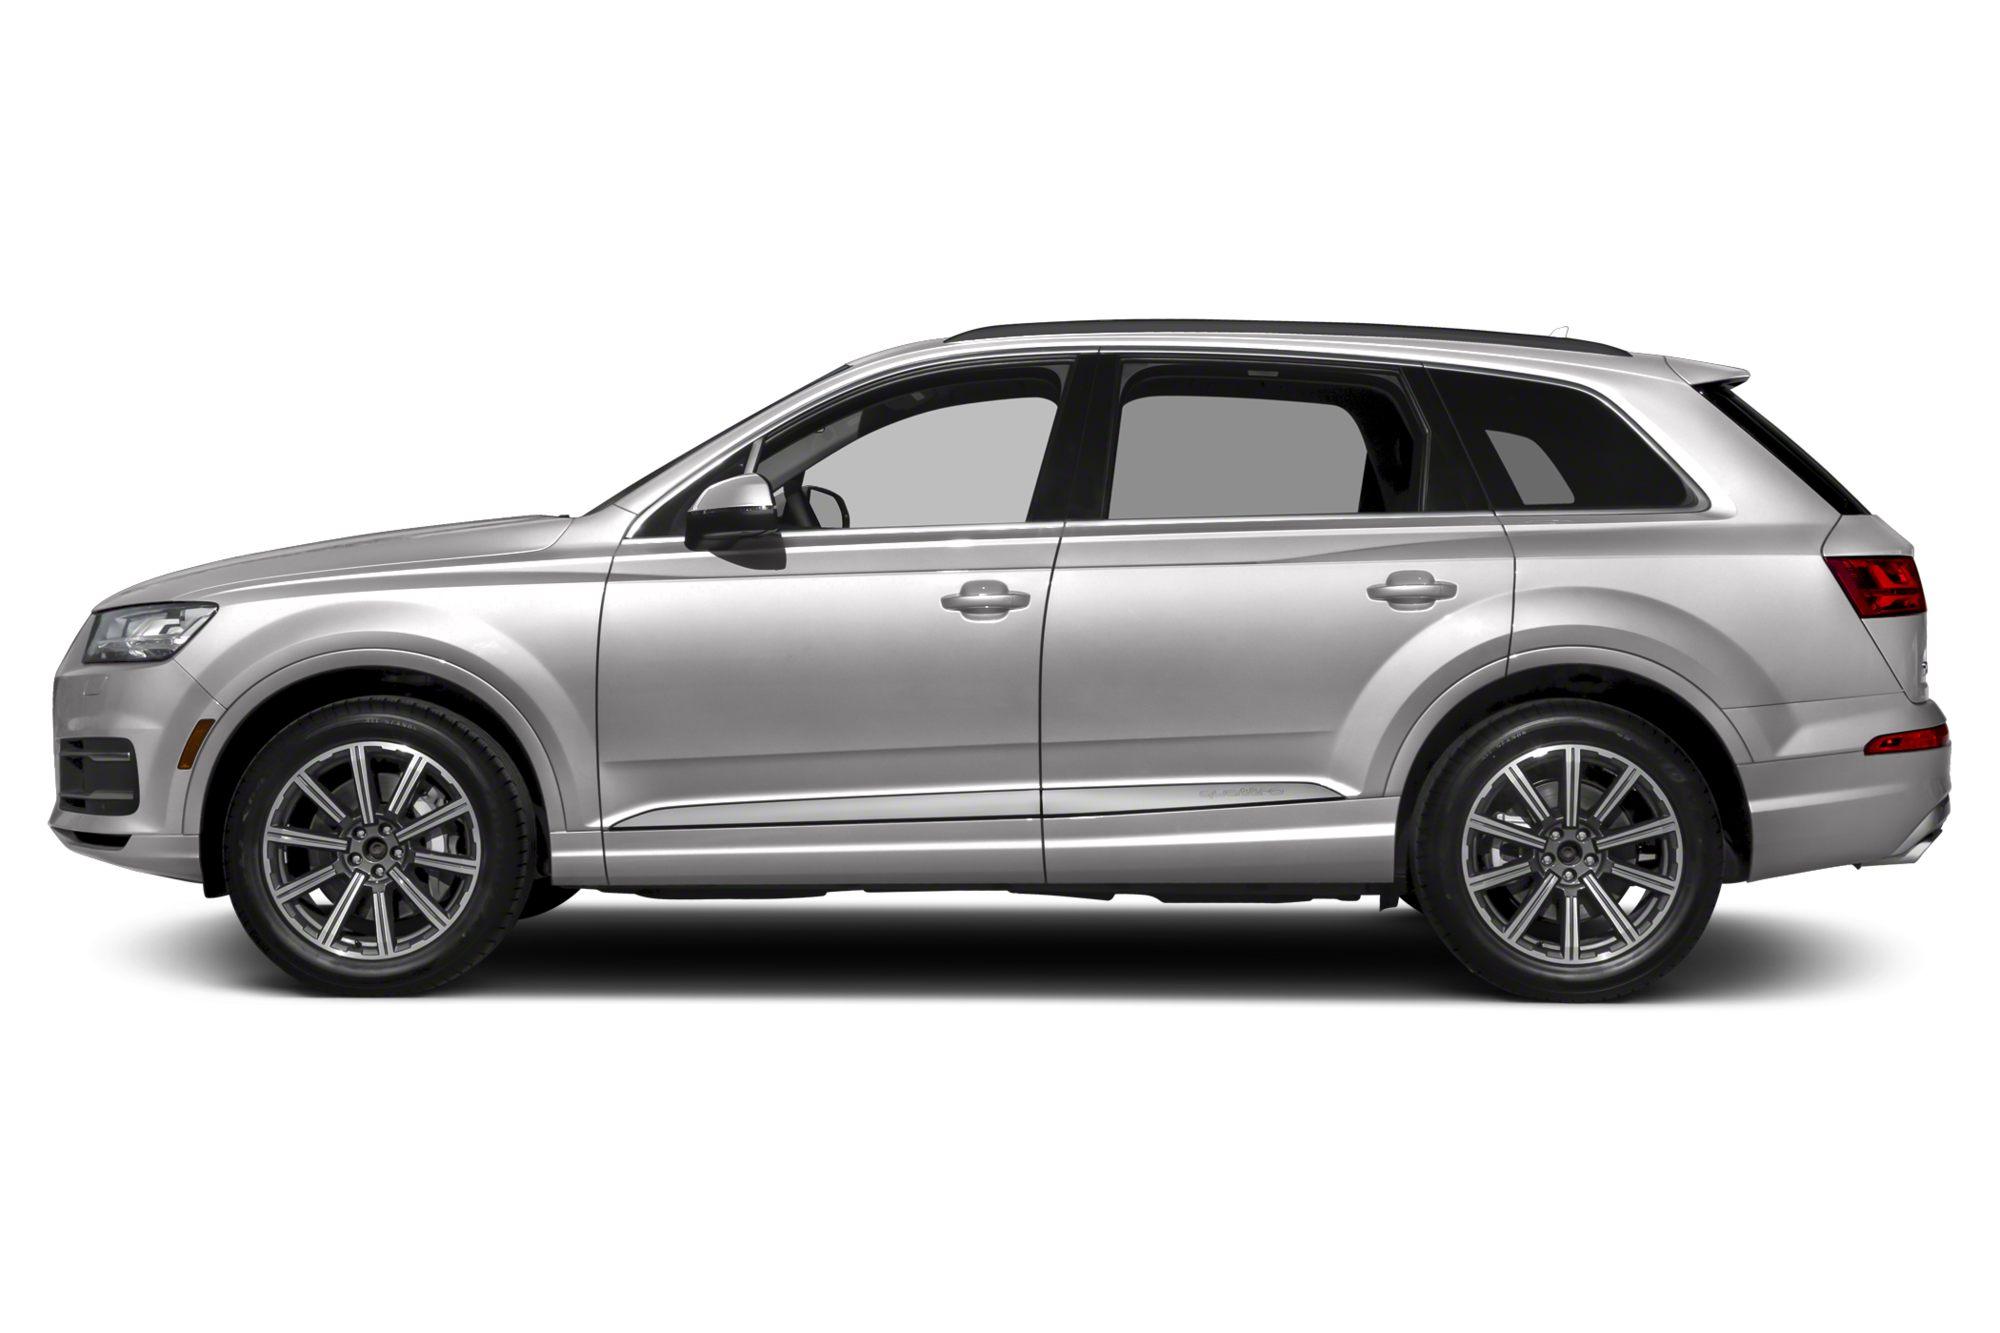 2017-2019 Audi Q7, Q8: Recall Alert